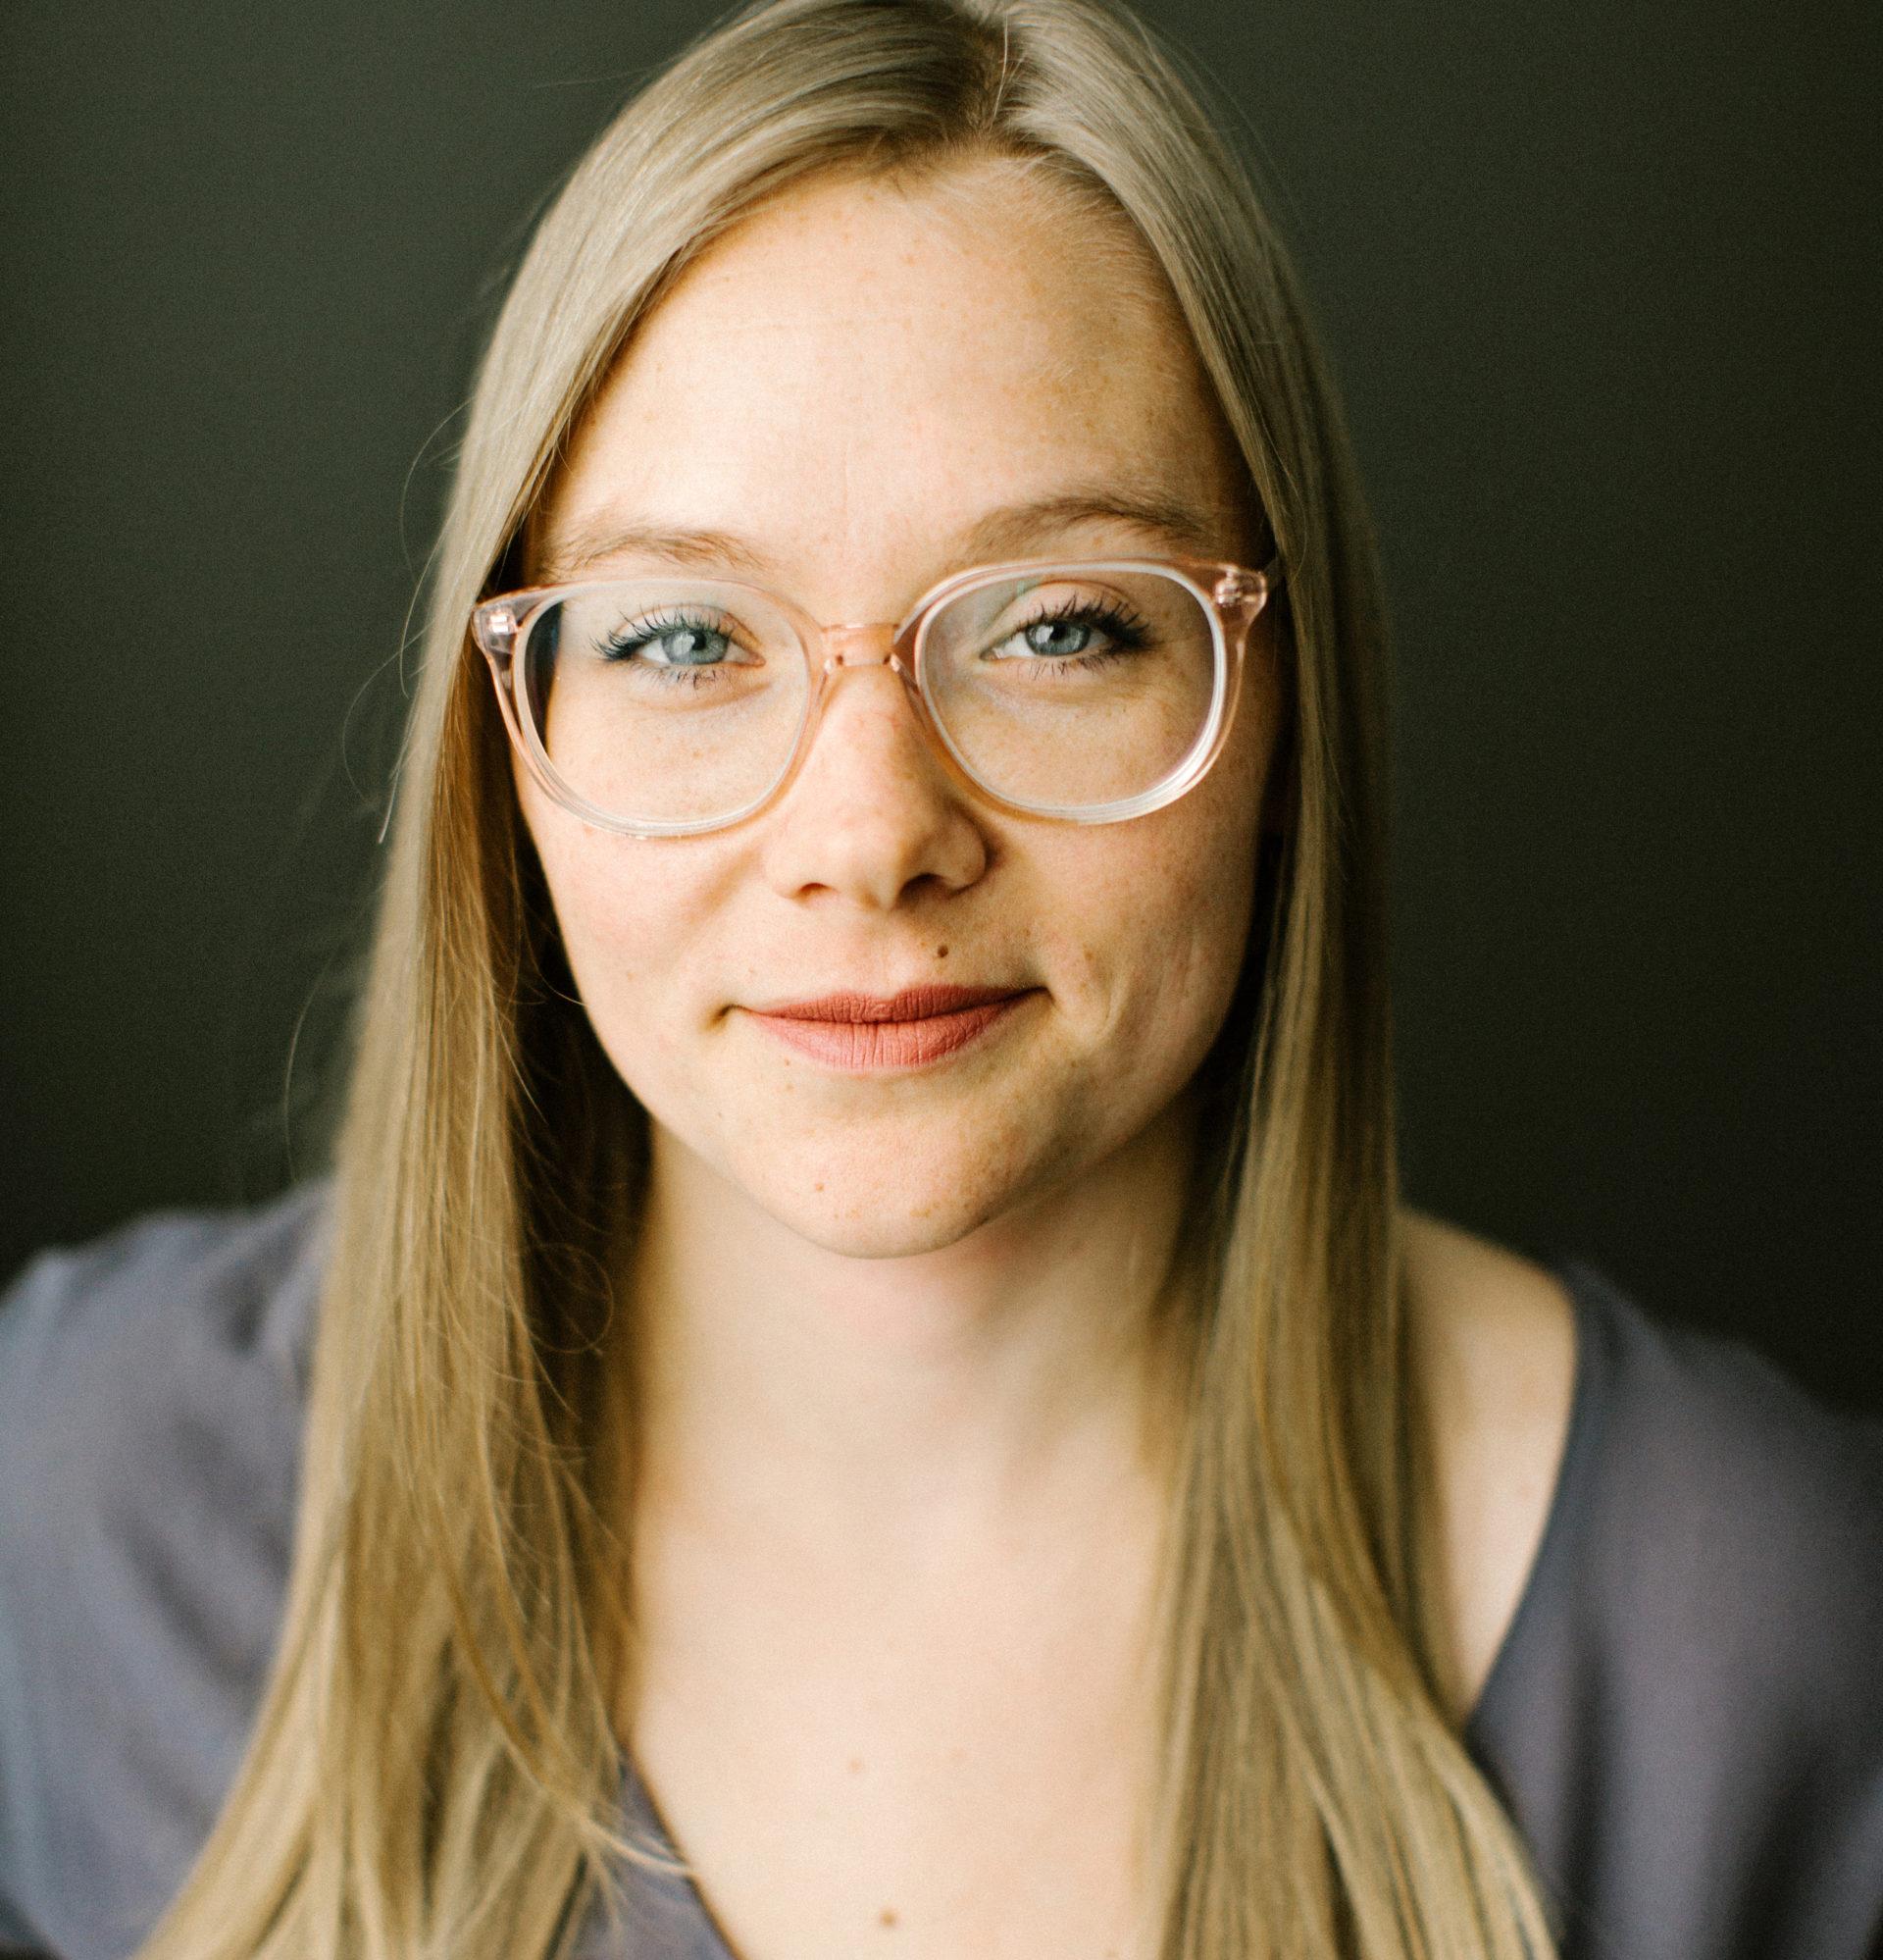 Kelsey Kudak